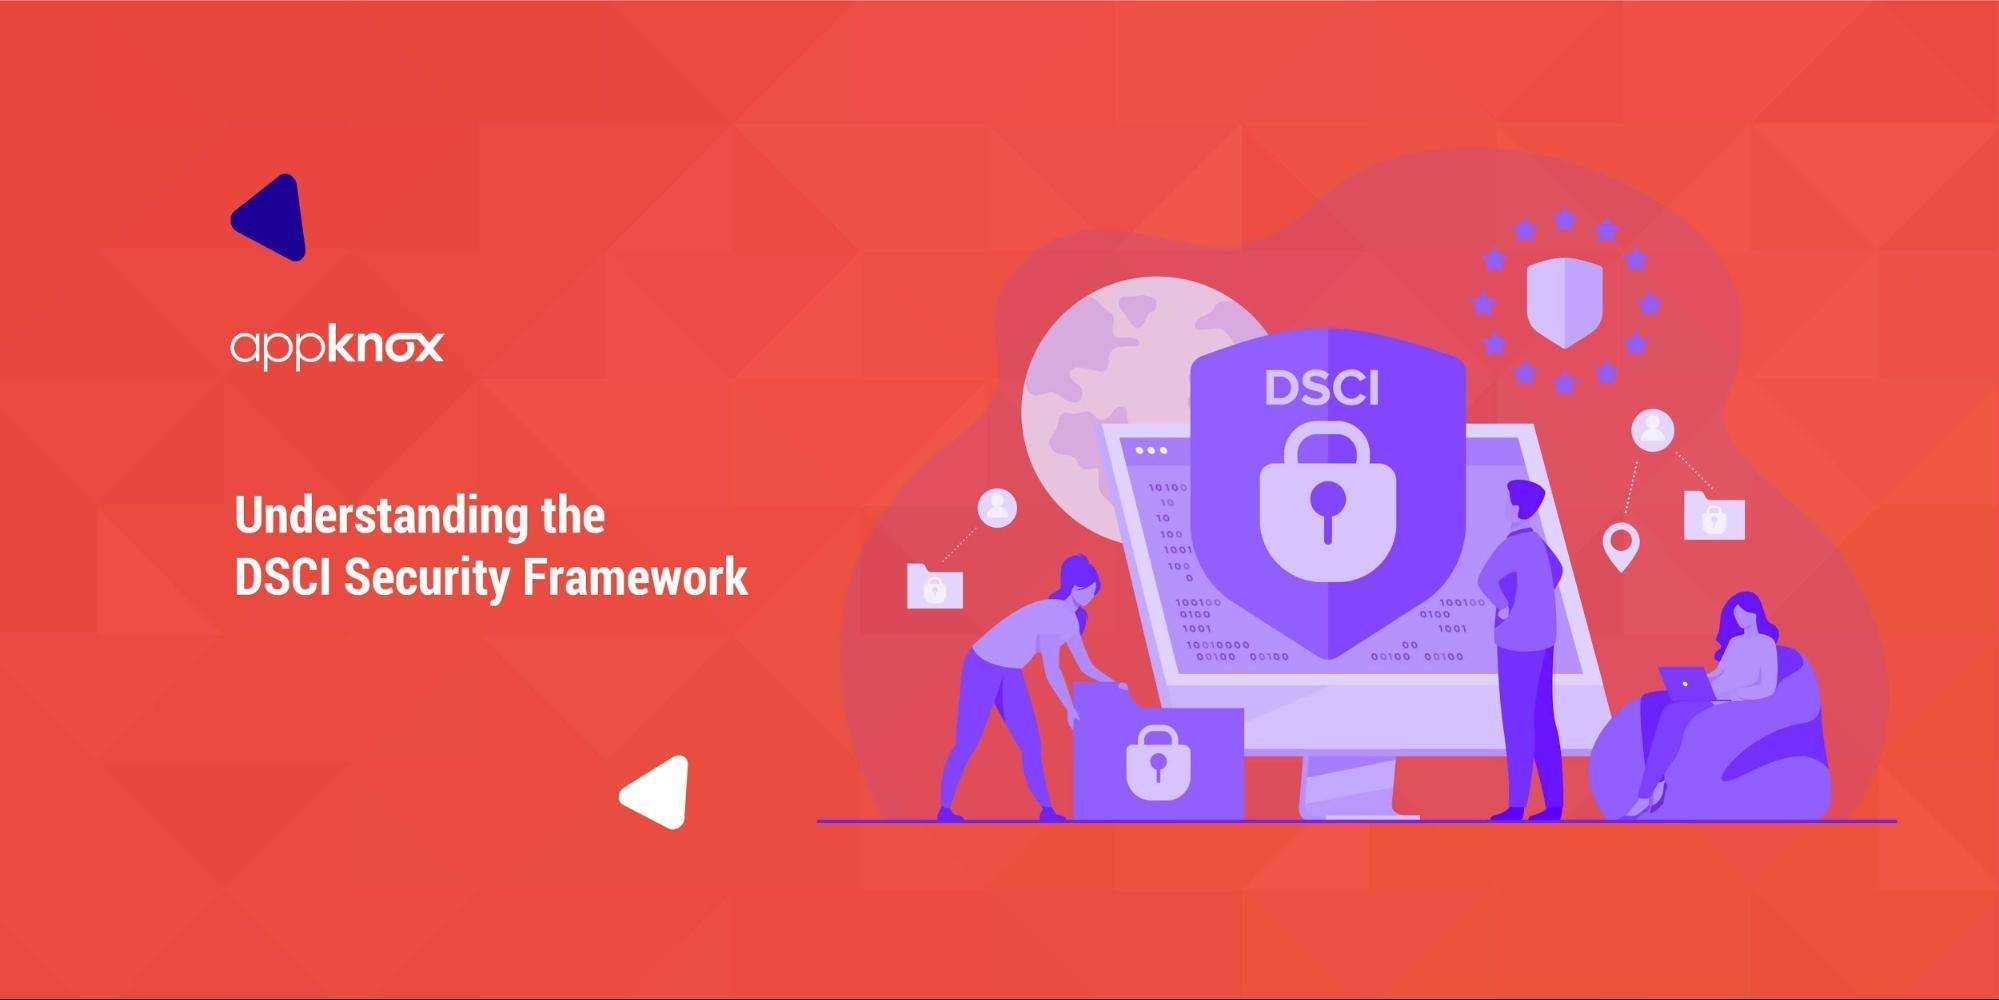 Understanding the DSCI Security Framework